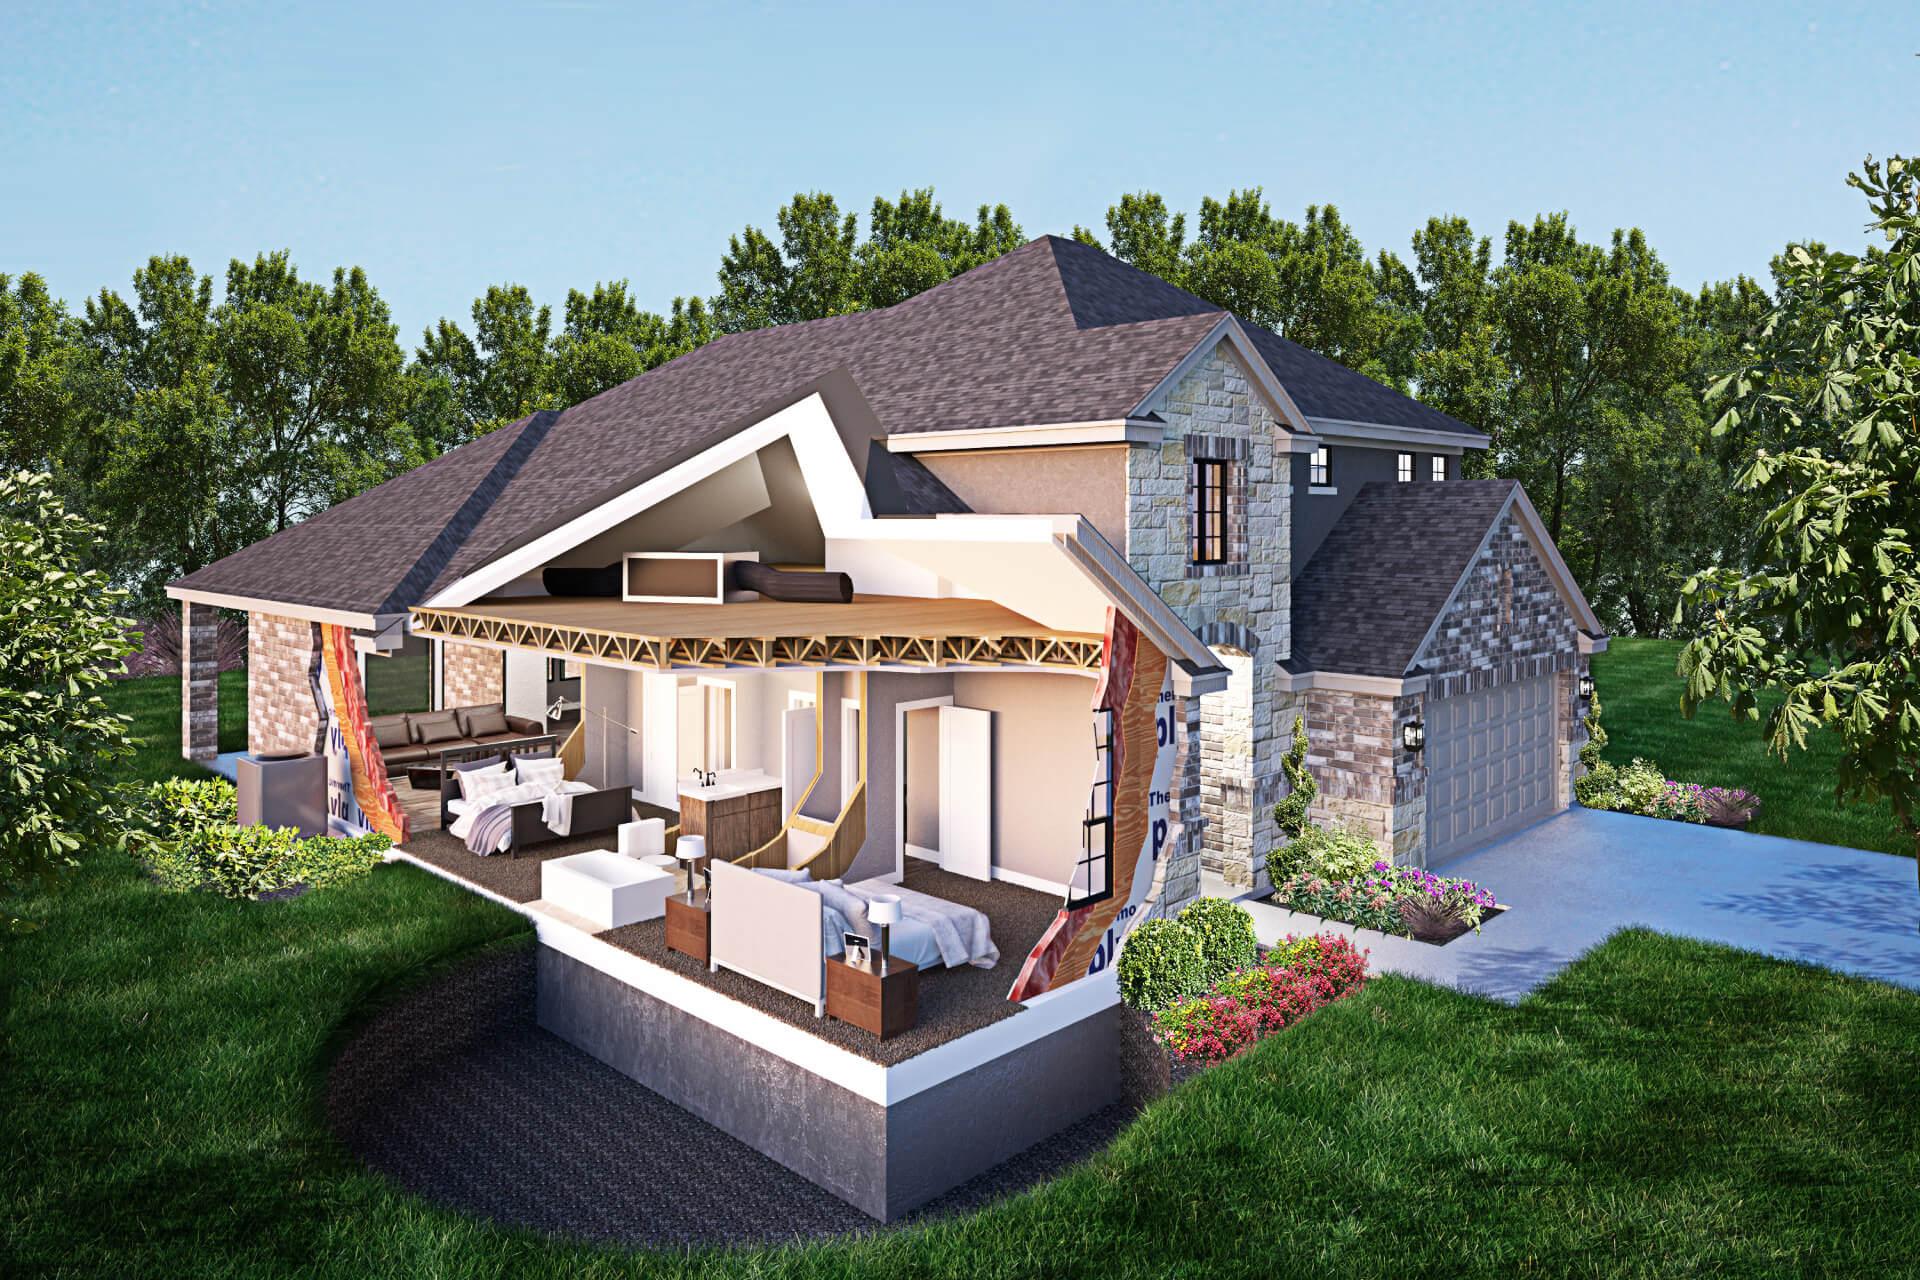 RNL Homes is a RESNET EnergySmart Builder